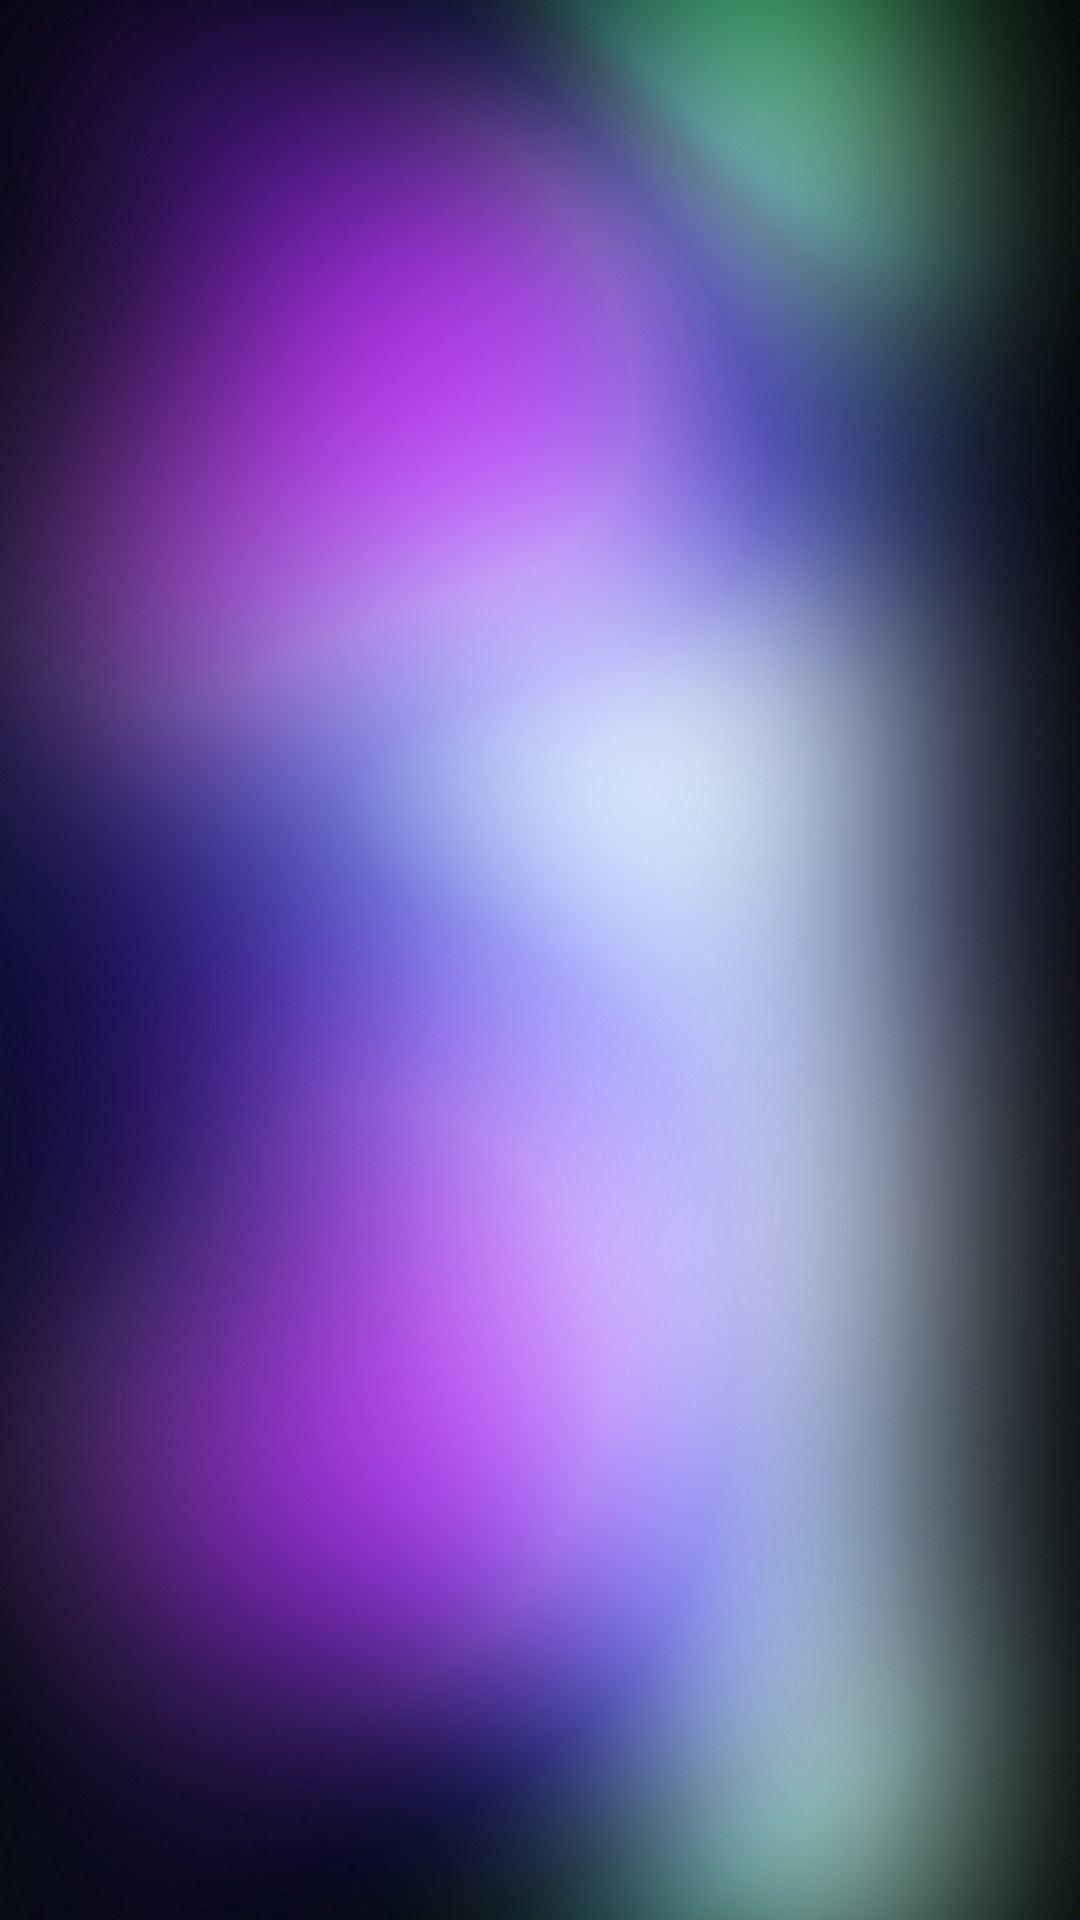 Electric Blue Purple Blur iPhone 6 Plus HD Wallpaper …